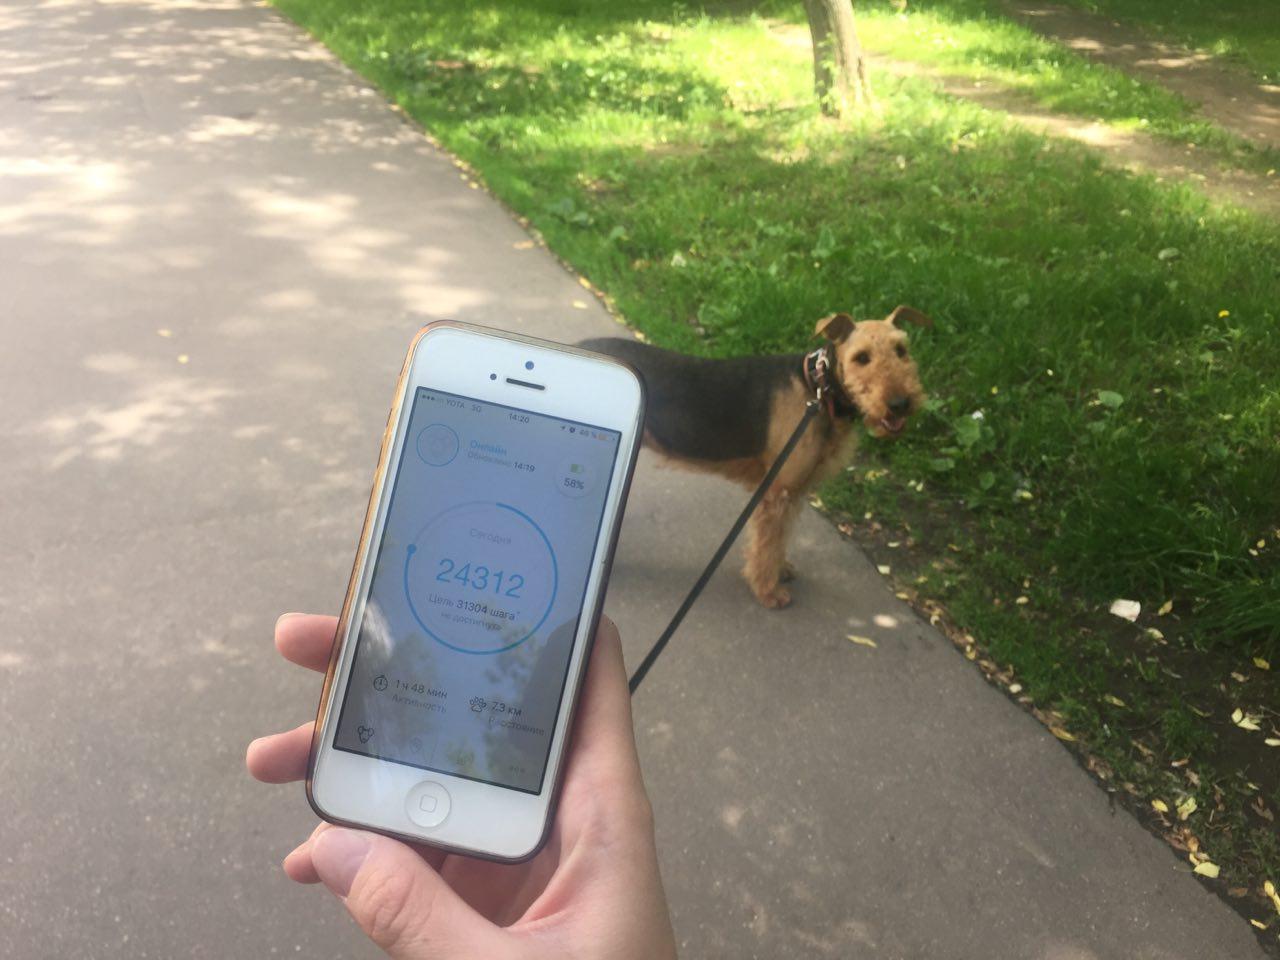 Как работает сервис по выгулу собак «Собака-гуляка» - 4